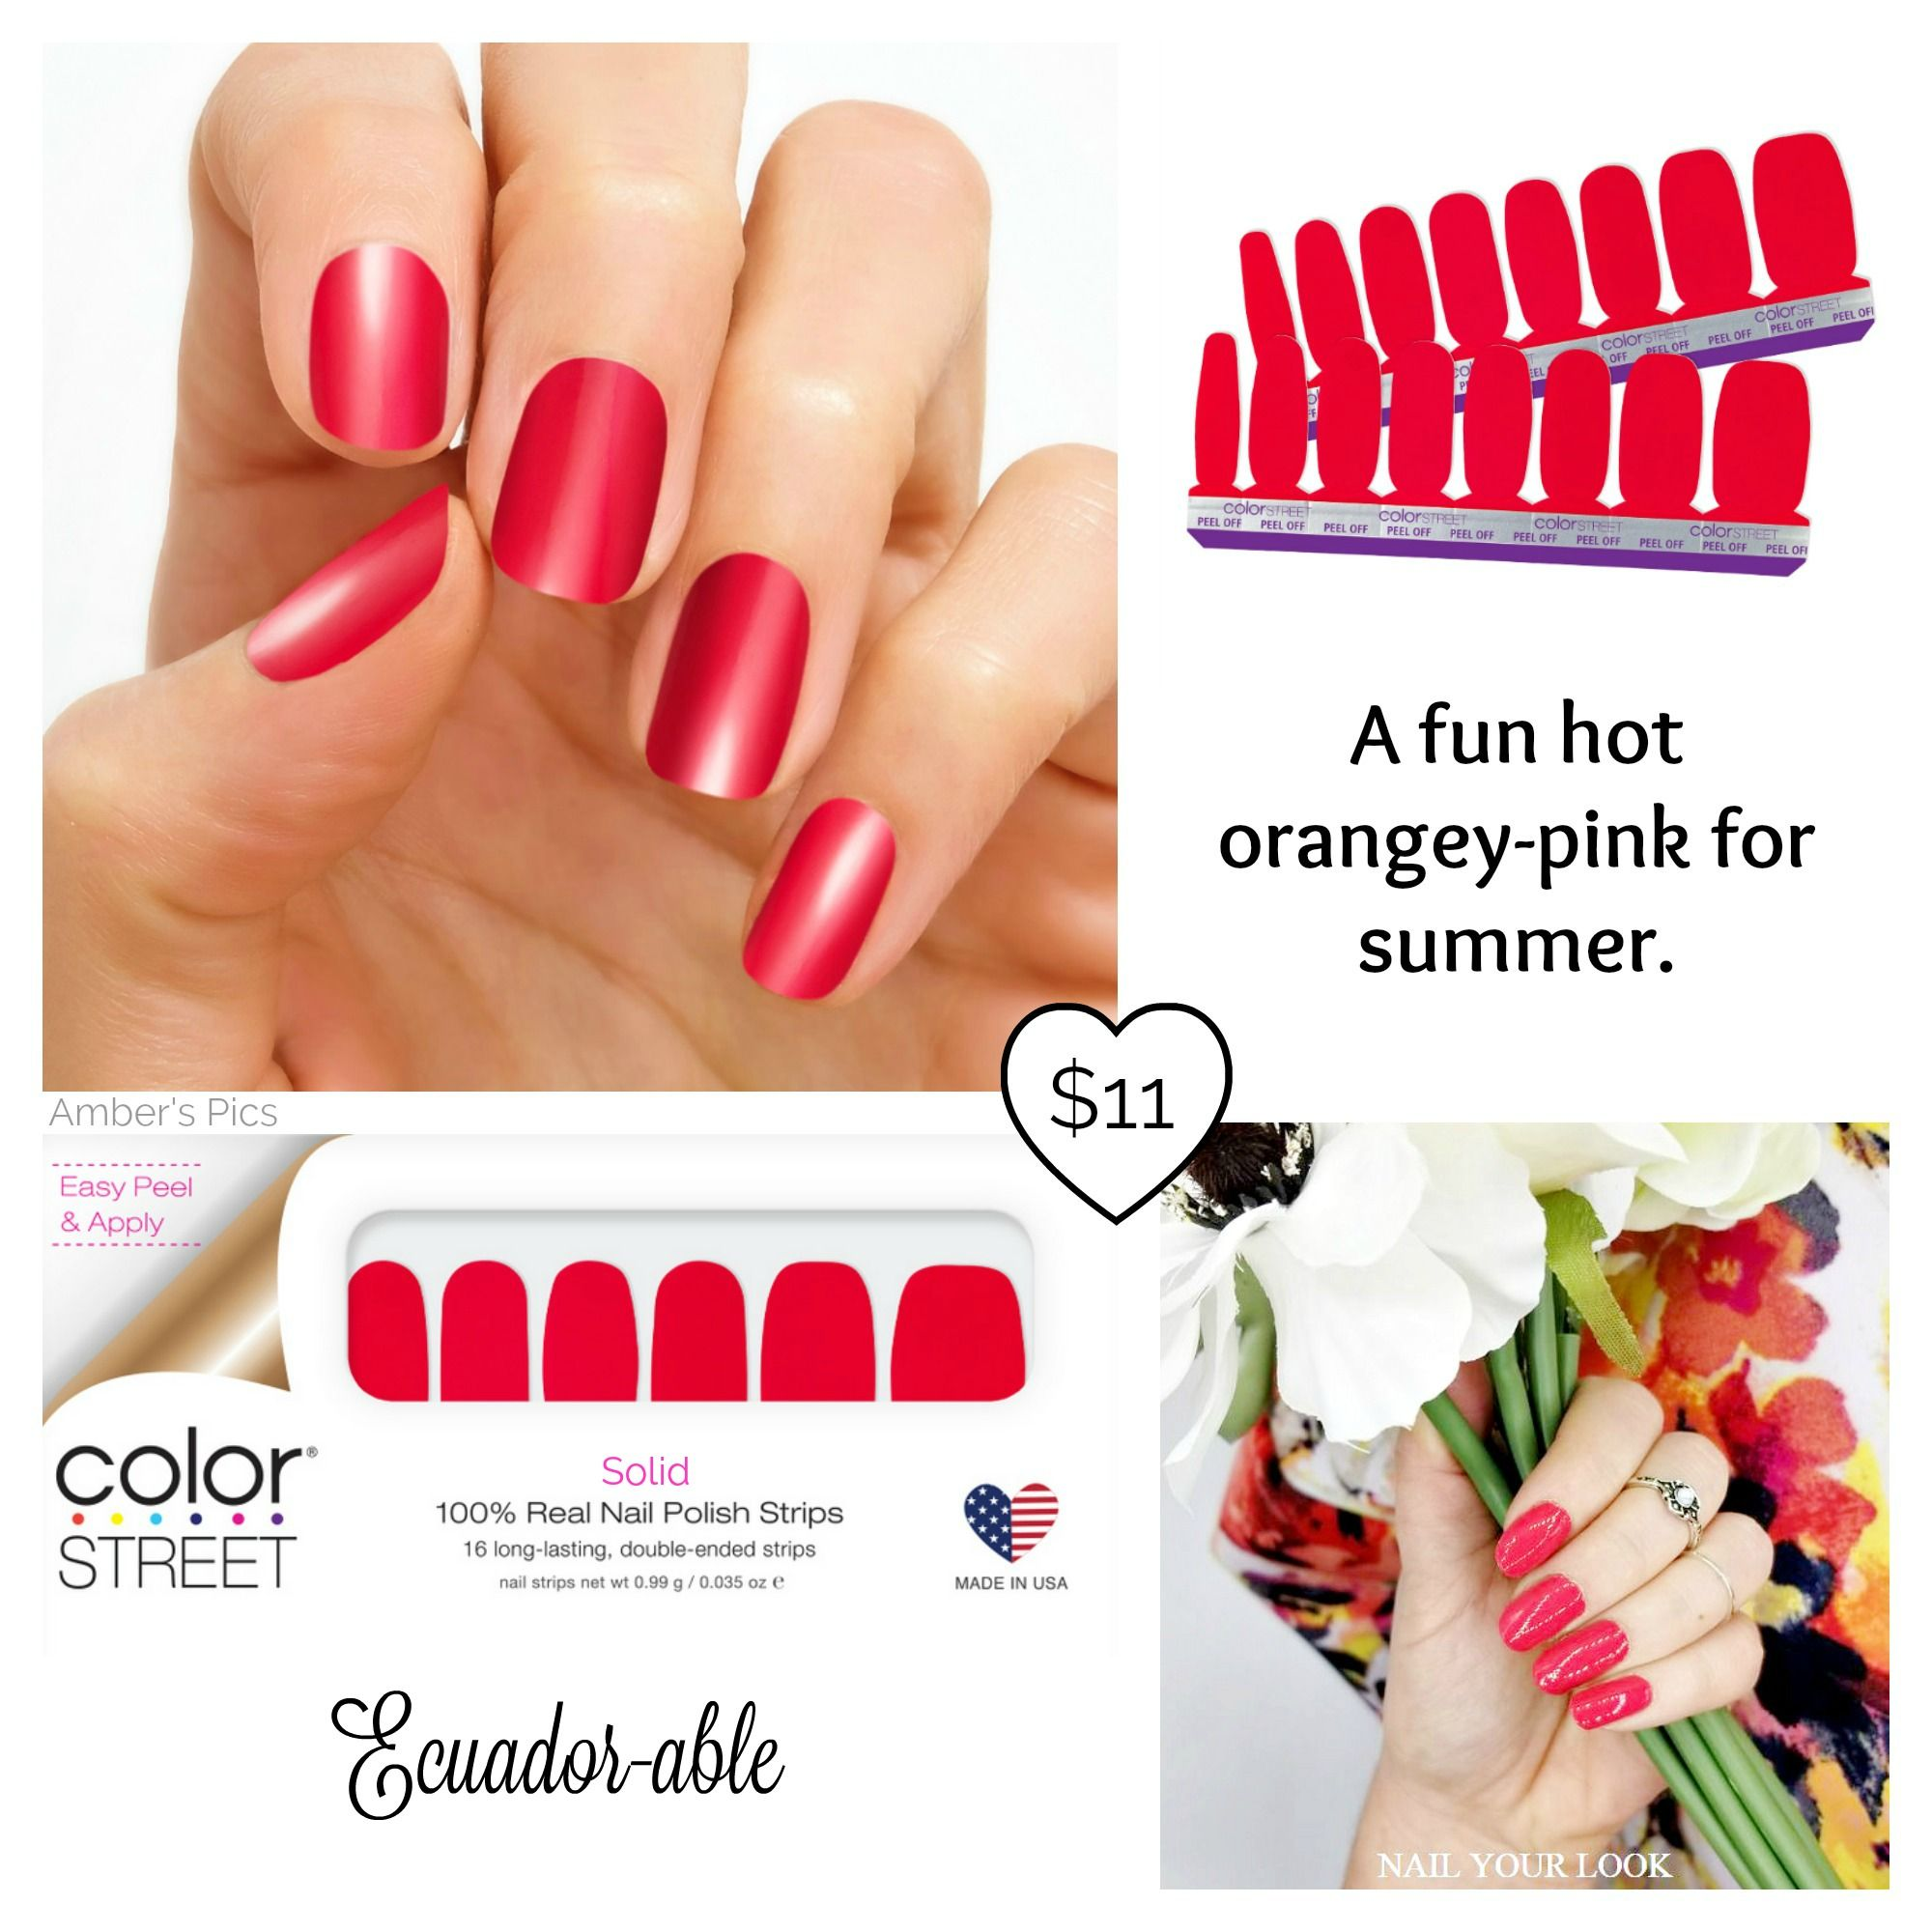 Ecuadorable color street nails color street nails